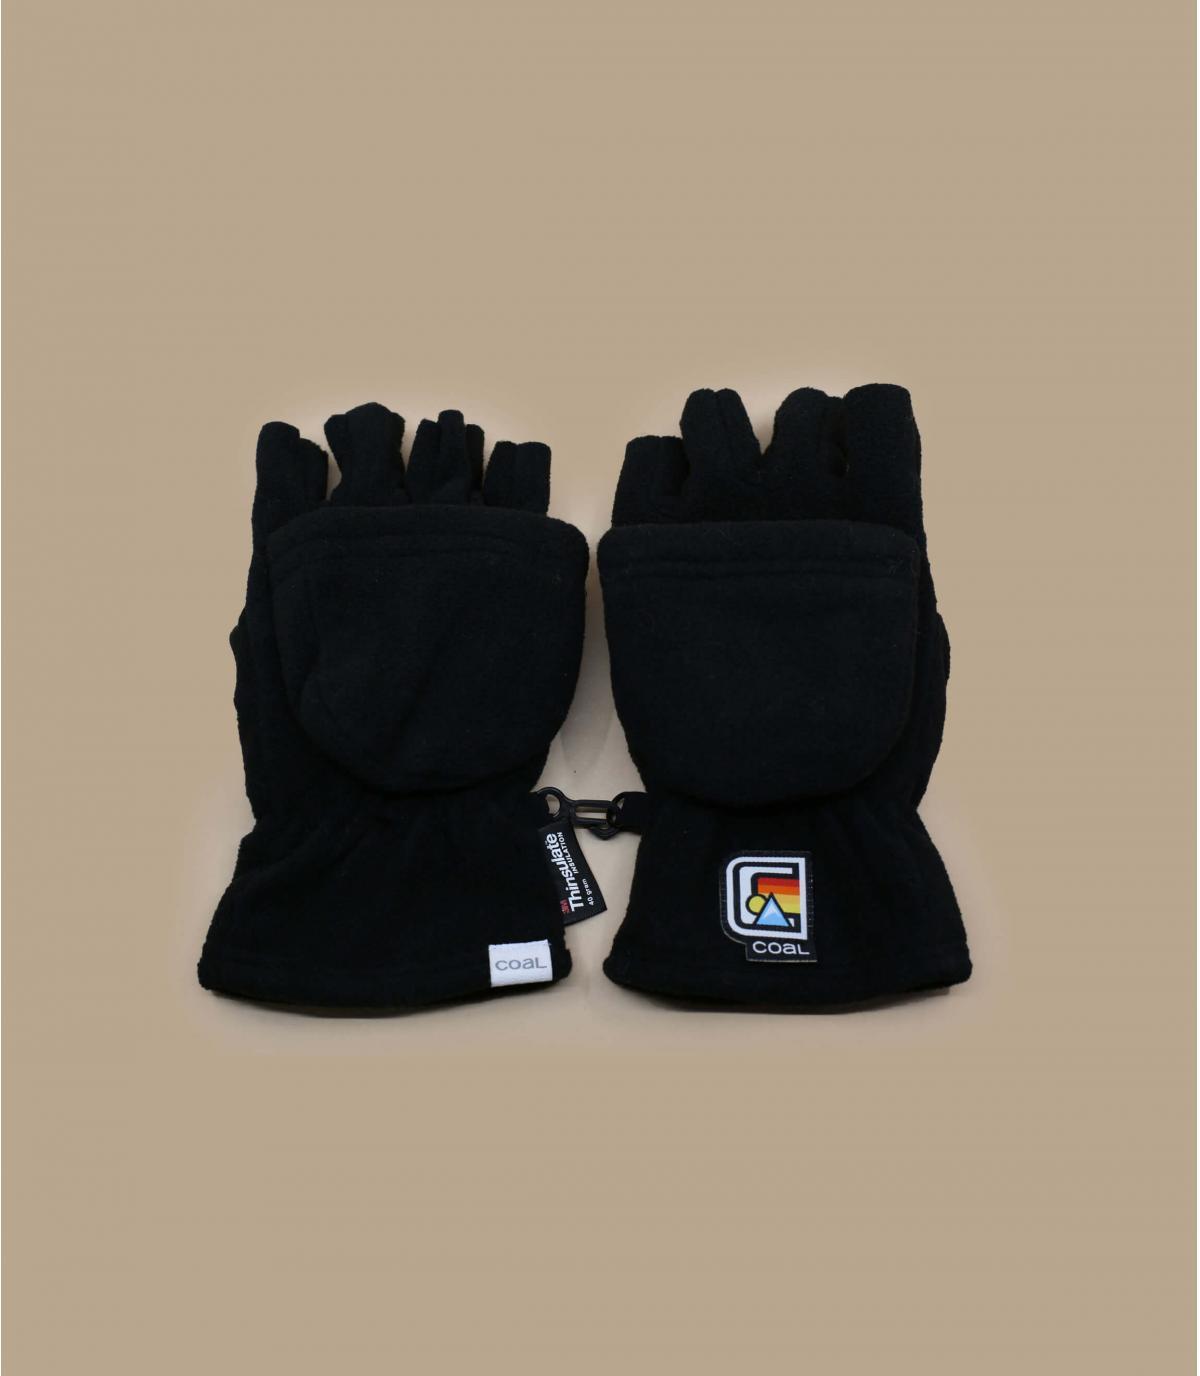 Details The Wherever Glove black - Abbildung 2